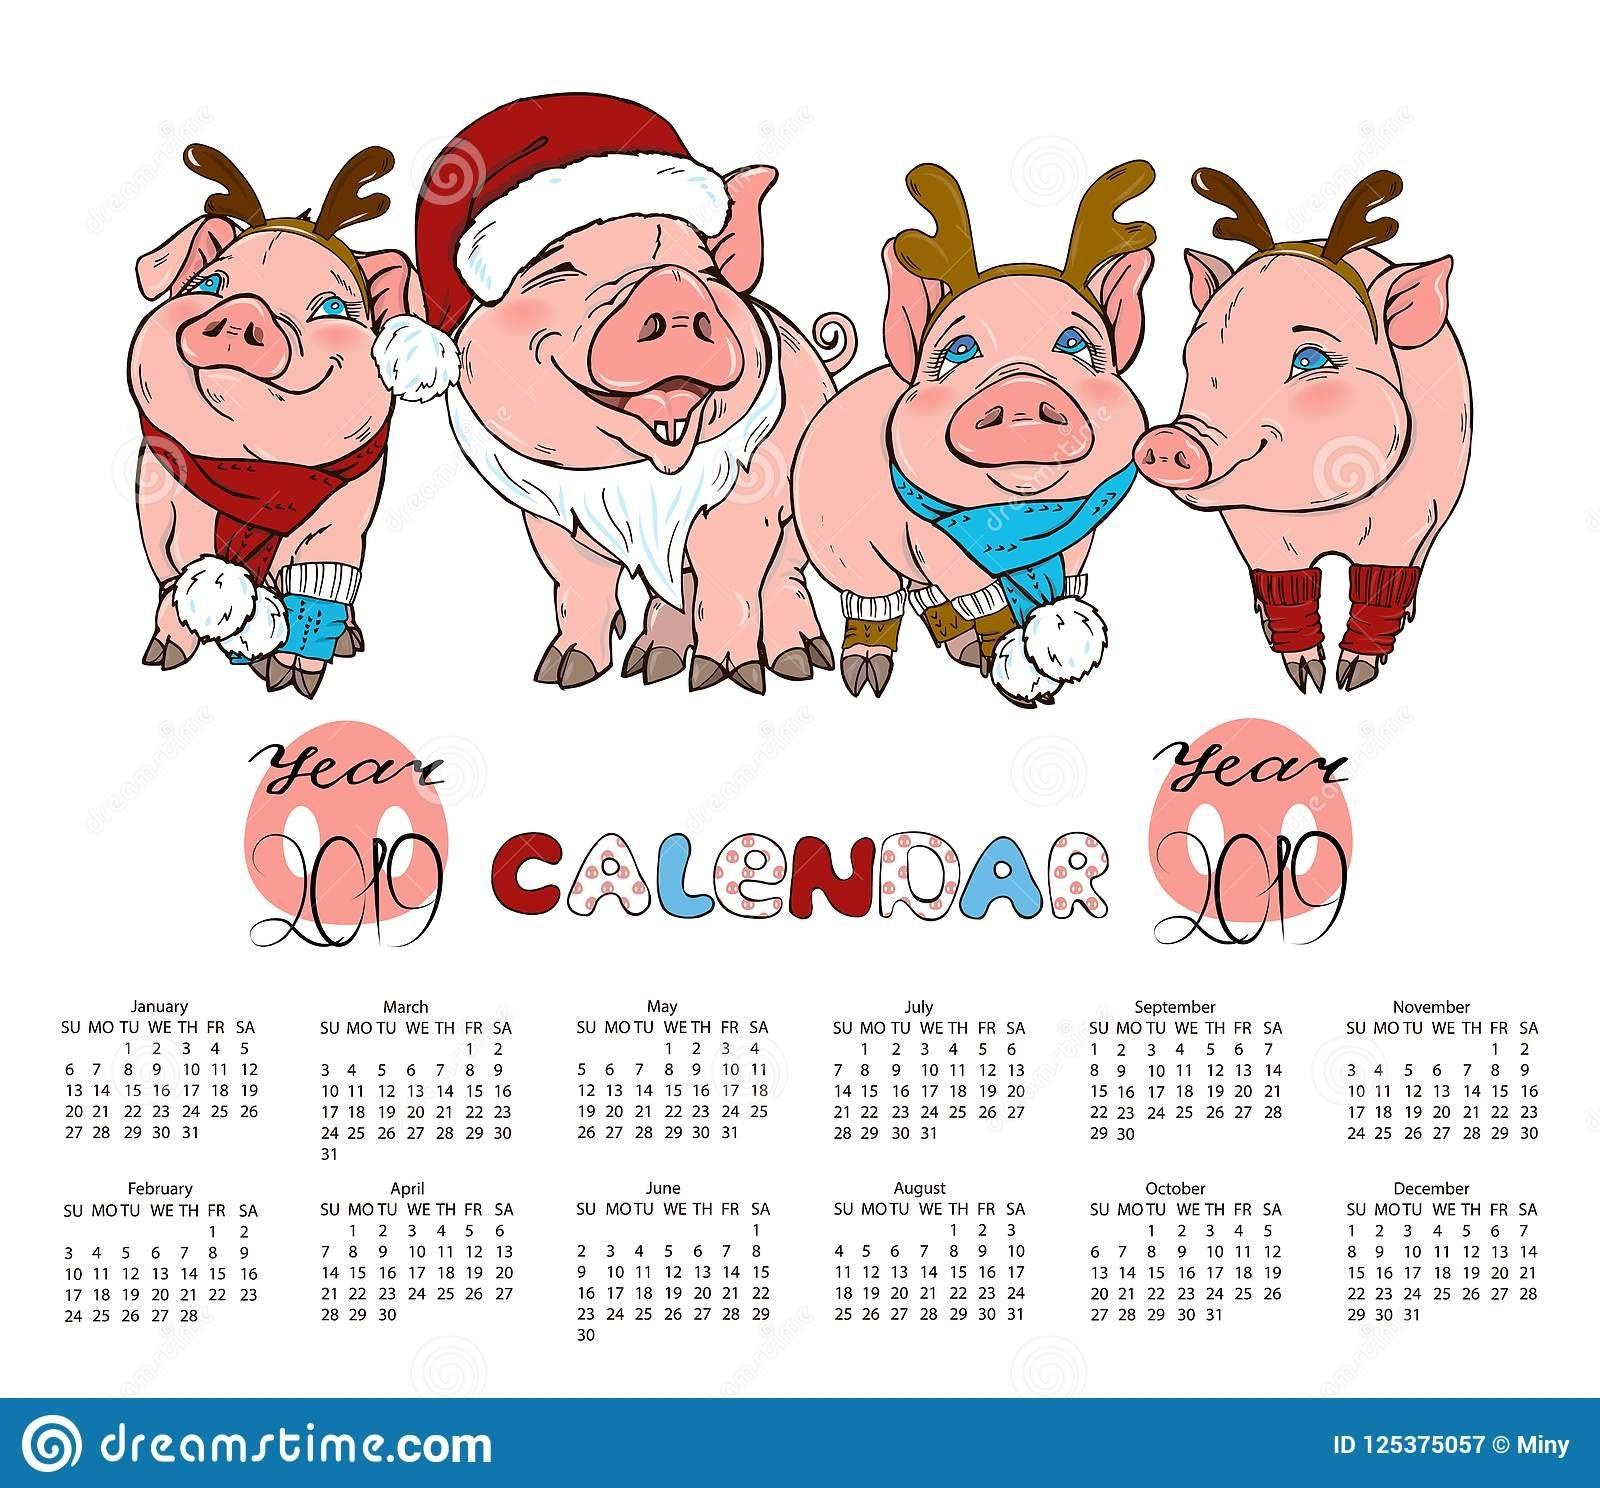 Get Kalender Met Varkens | Best Calendar Example With Lego 6213564 Star Wars Tm Advent Calendar 75213 2021 Edition Minifigures Small Building Toys Christmas Countdown Calendar K